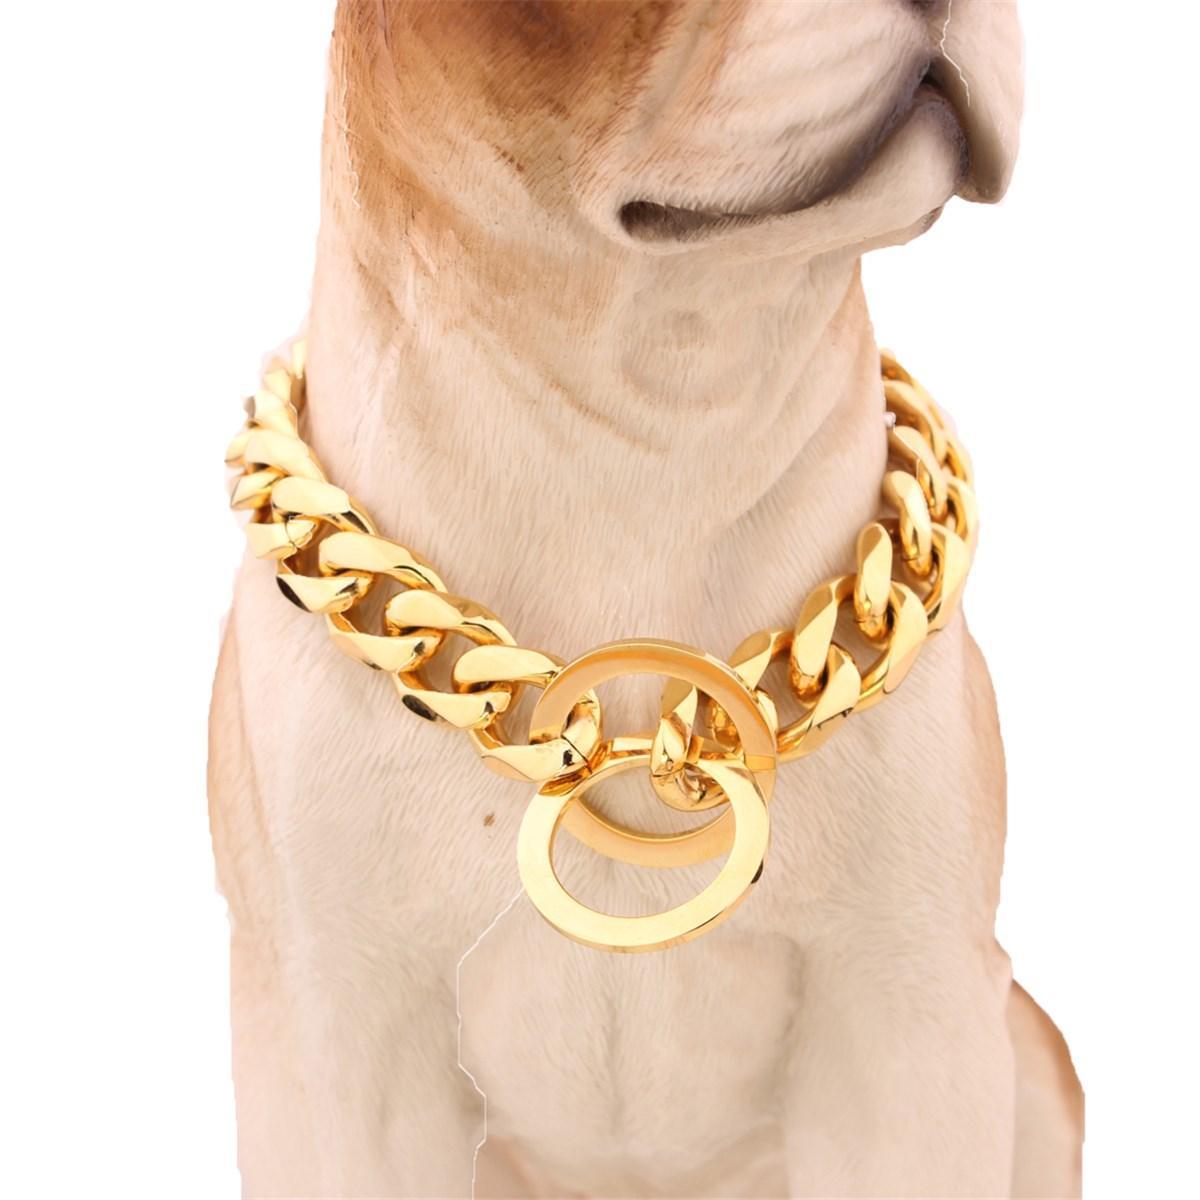 Dog Supplies 12-22